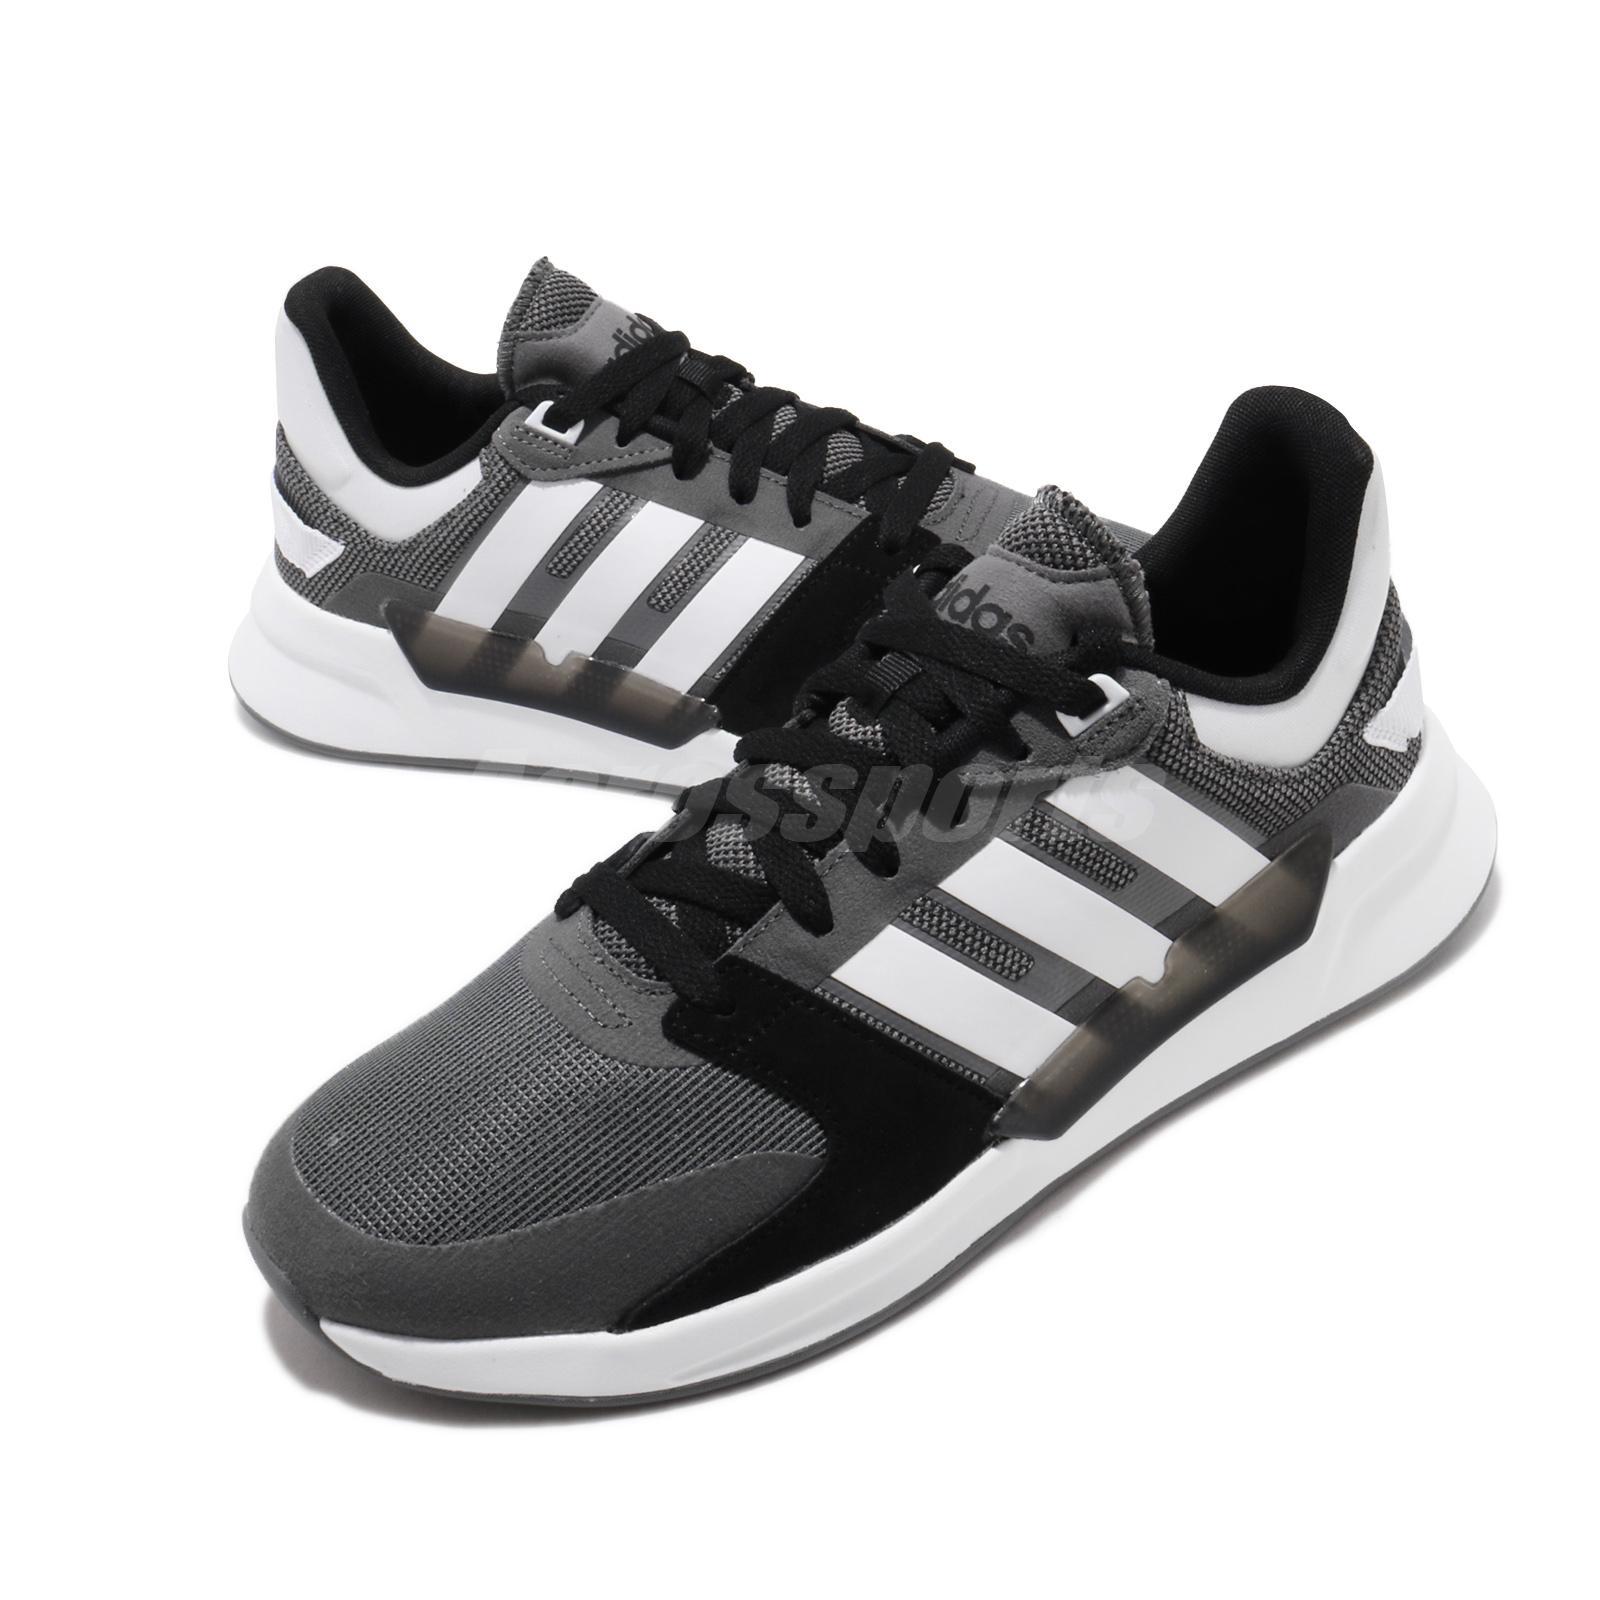 Mirar fijamente Estadio detrás  adidas Run 90s Grey White Men Running Casual Lifestyle Shoes Sneakers  EF0584 | eBay